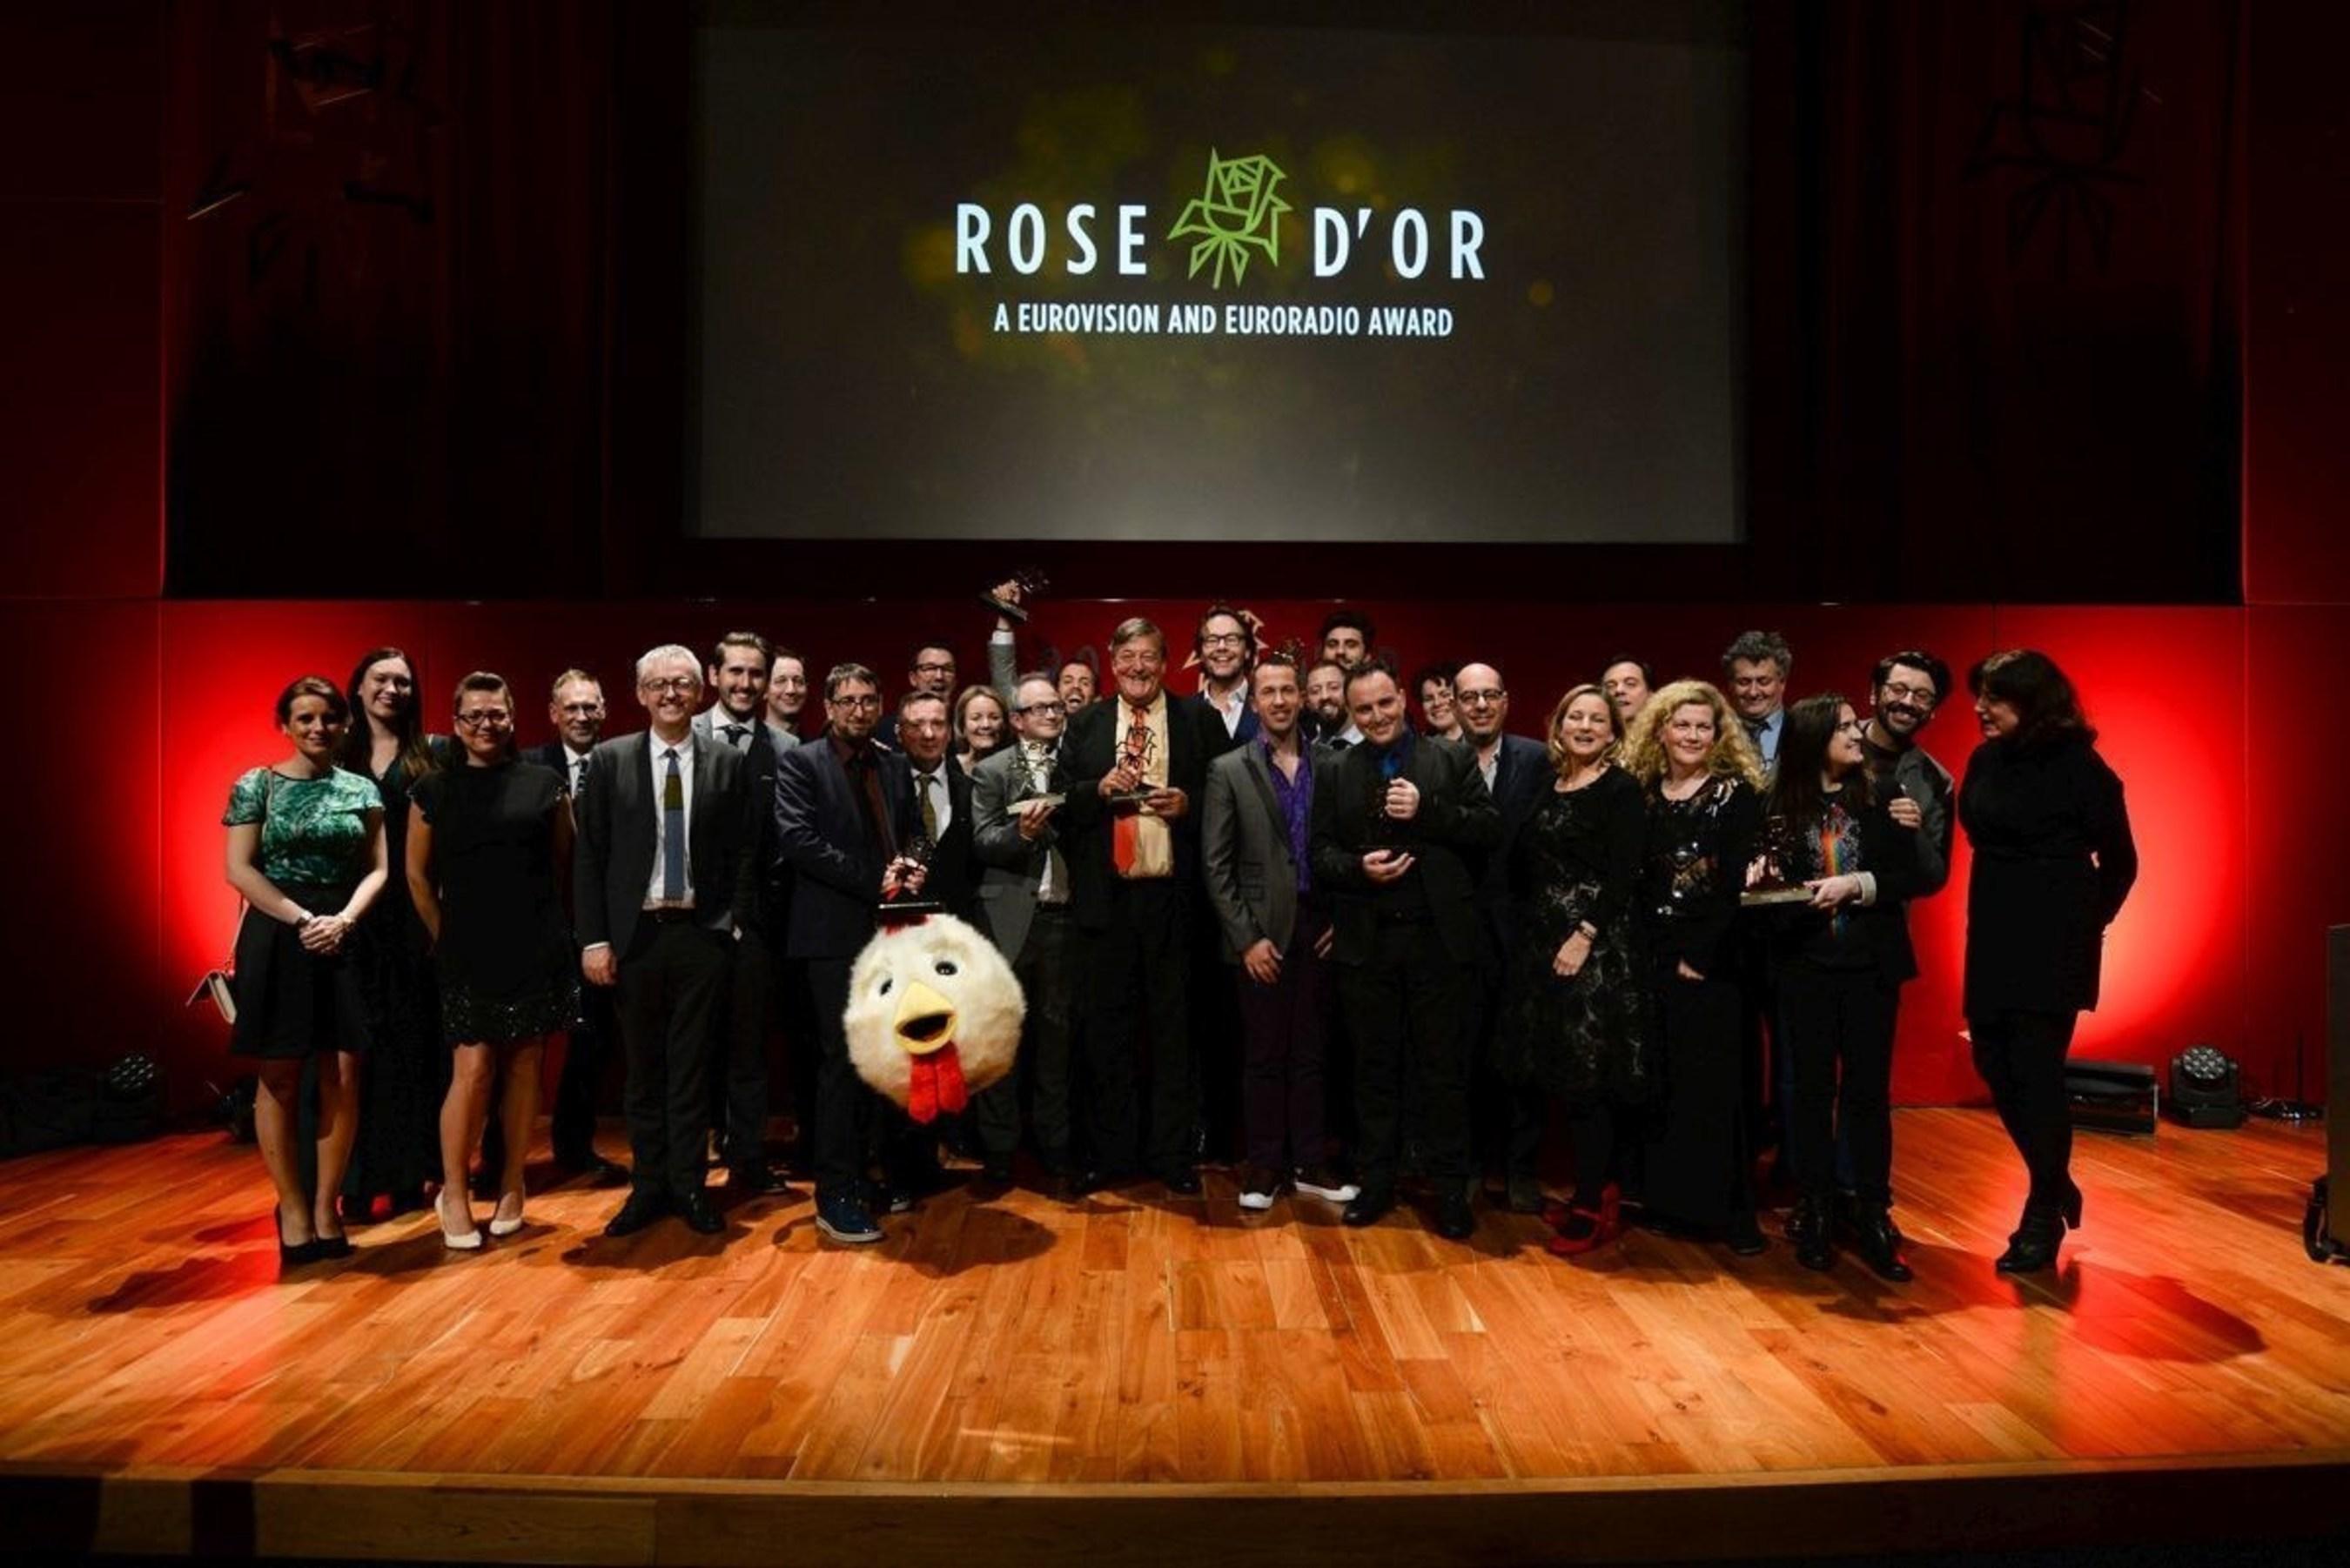 Rose d'Or 2015 winners on stage with lifetime award winner Stephen Fry (PRNewsFoto/European Broadcasting Union) (PRNewsFoto/European Broadcasting Union)